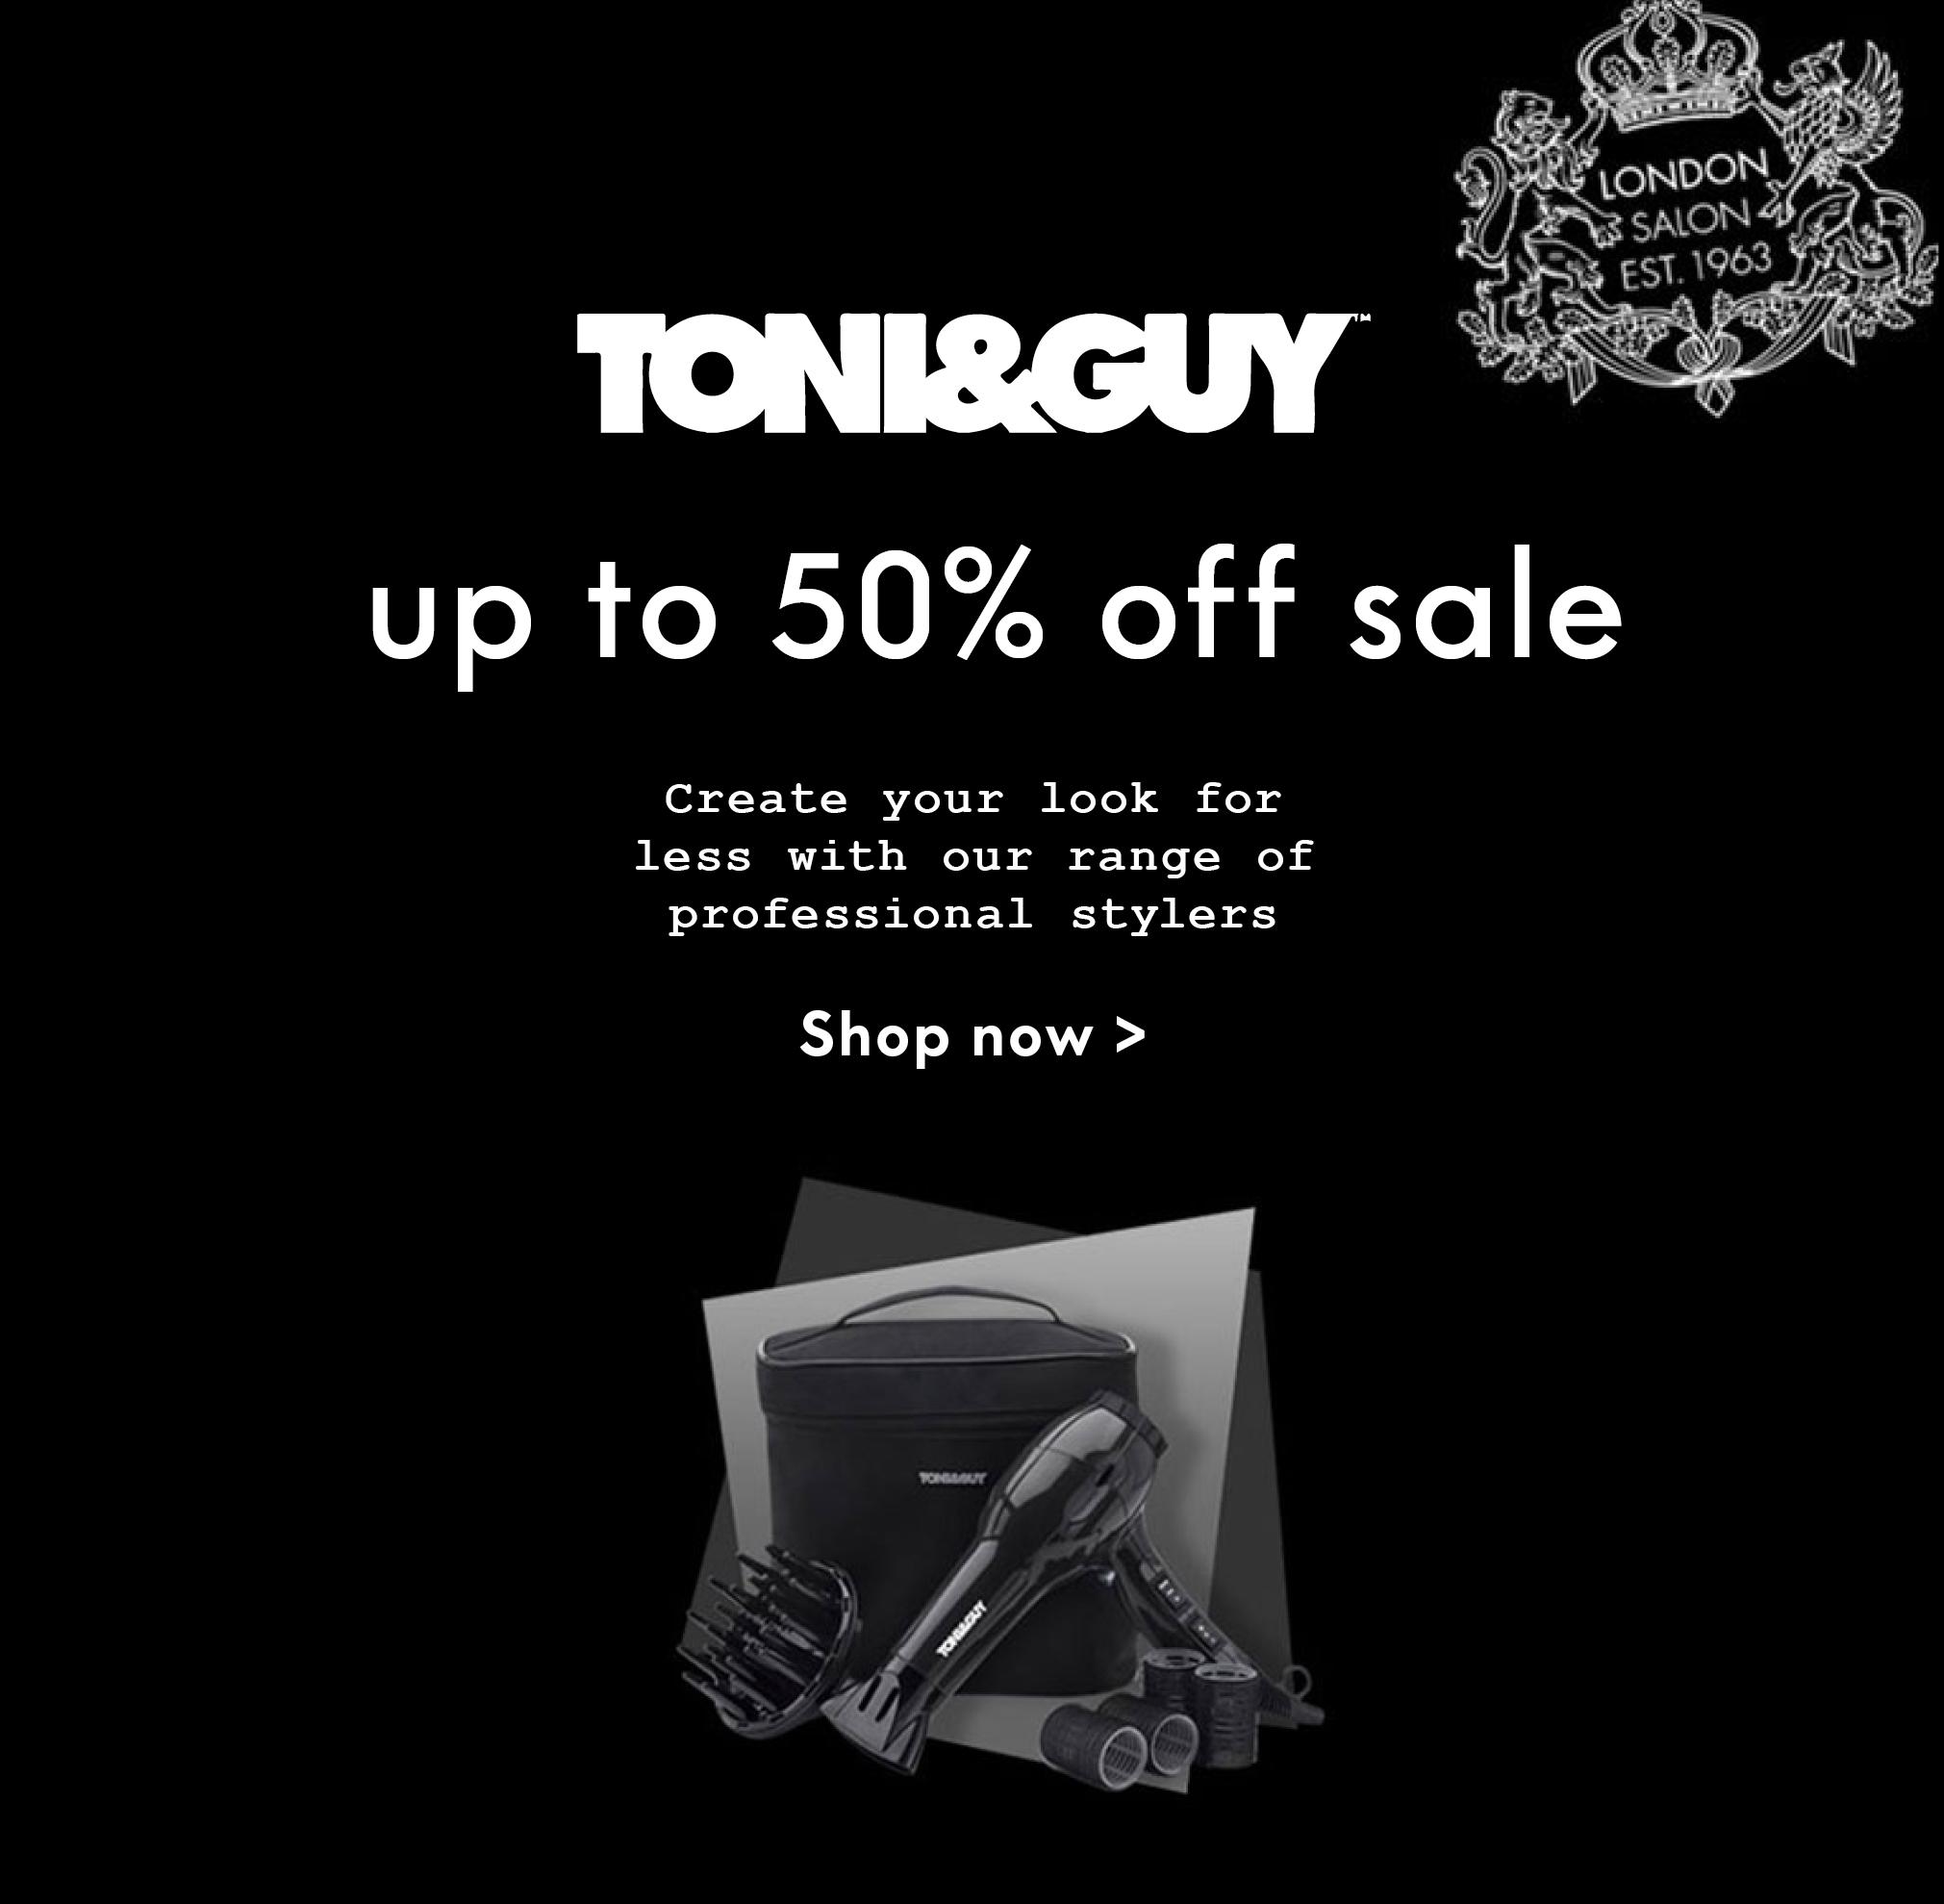 TONI&GUY electrical sale